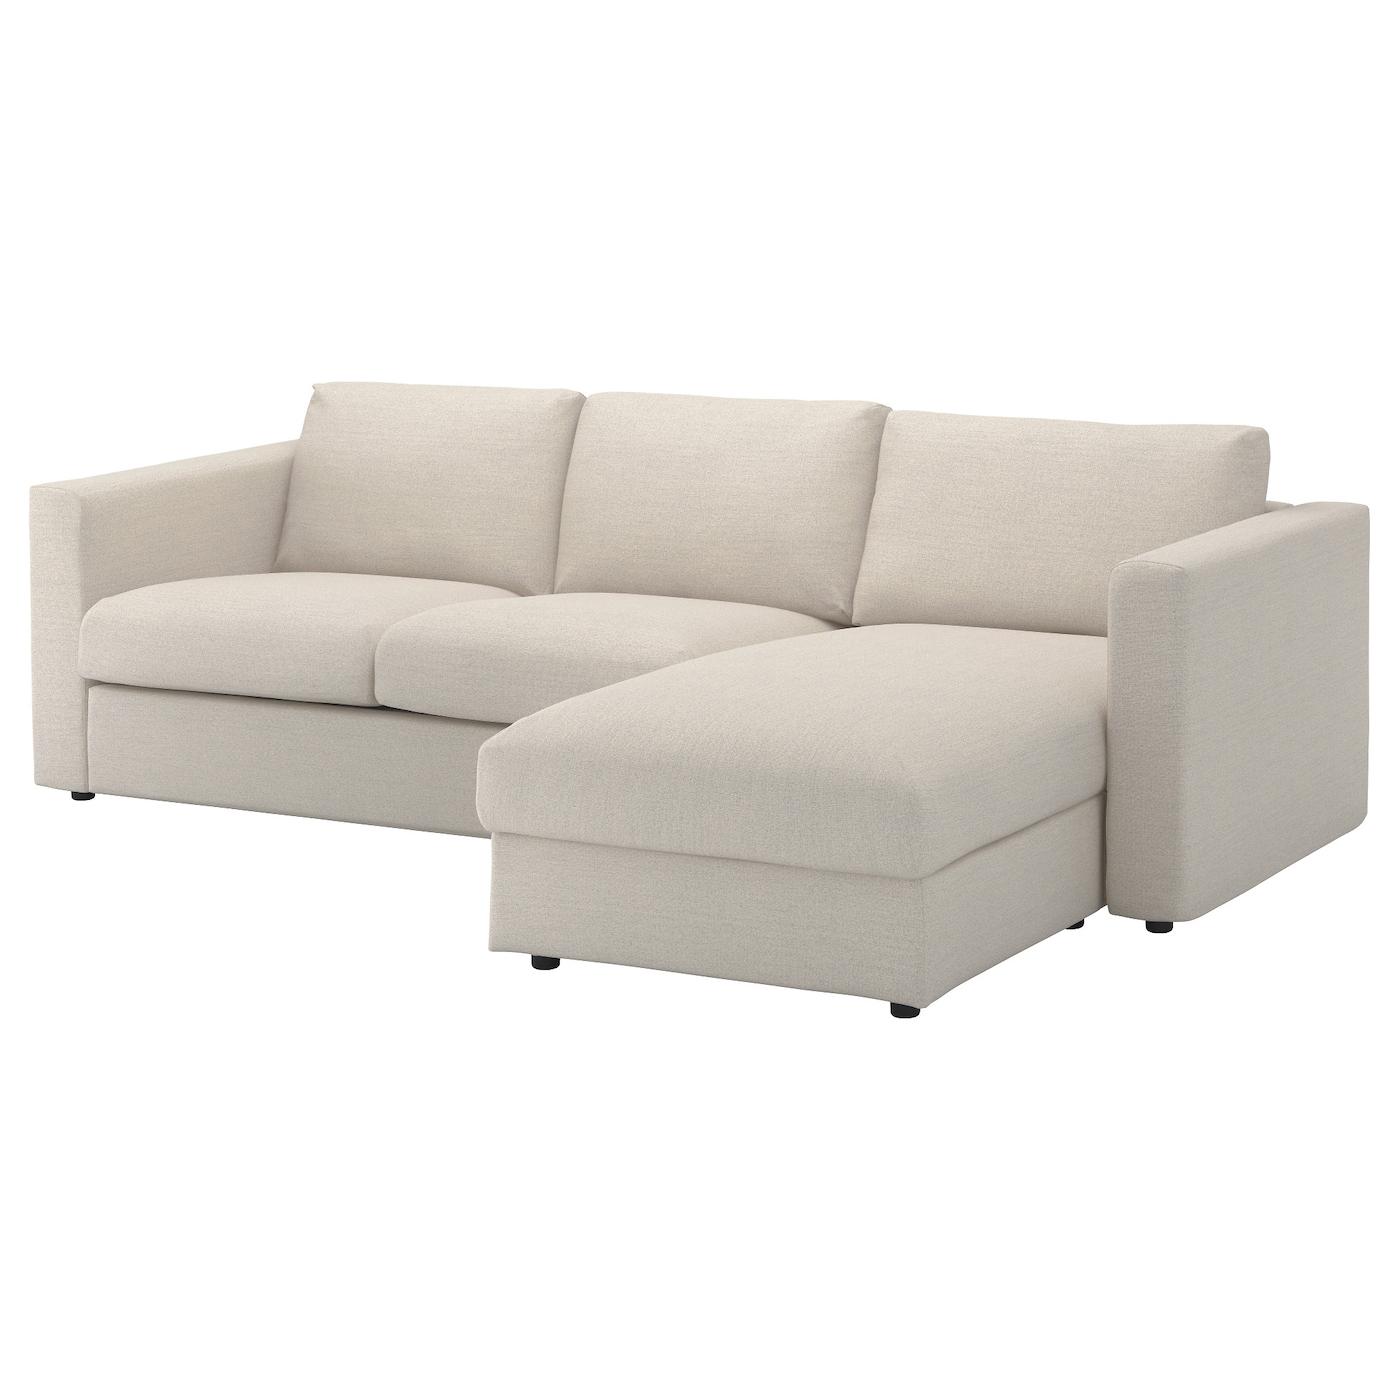 vimle 3 zitsbank met chaise longue gunnared beige ikea. Black Bedroom Furniture Sets. Home Design Ideas